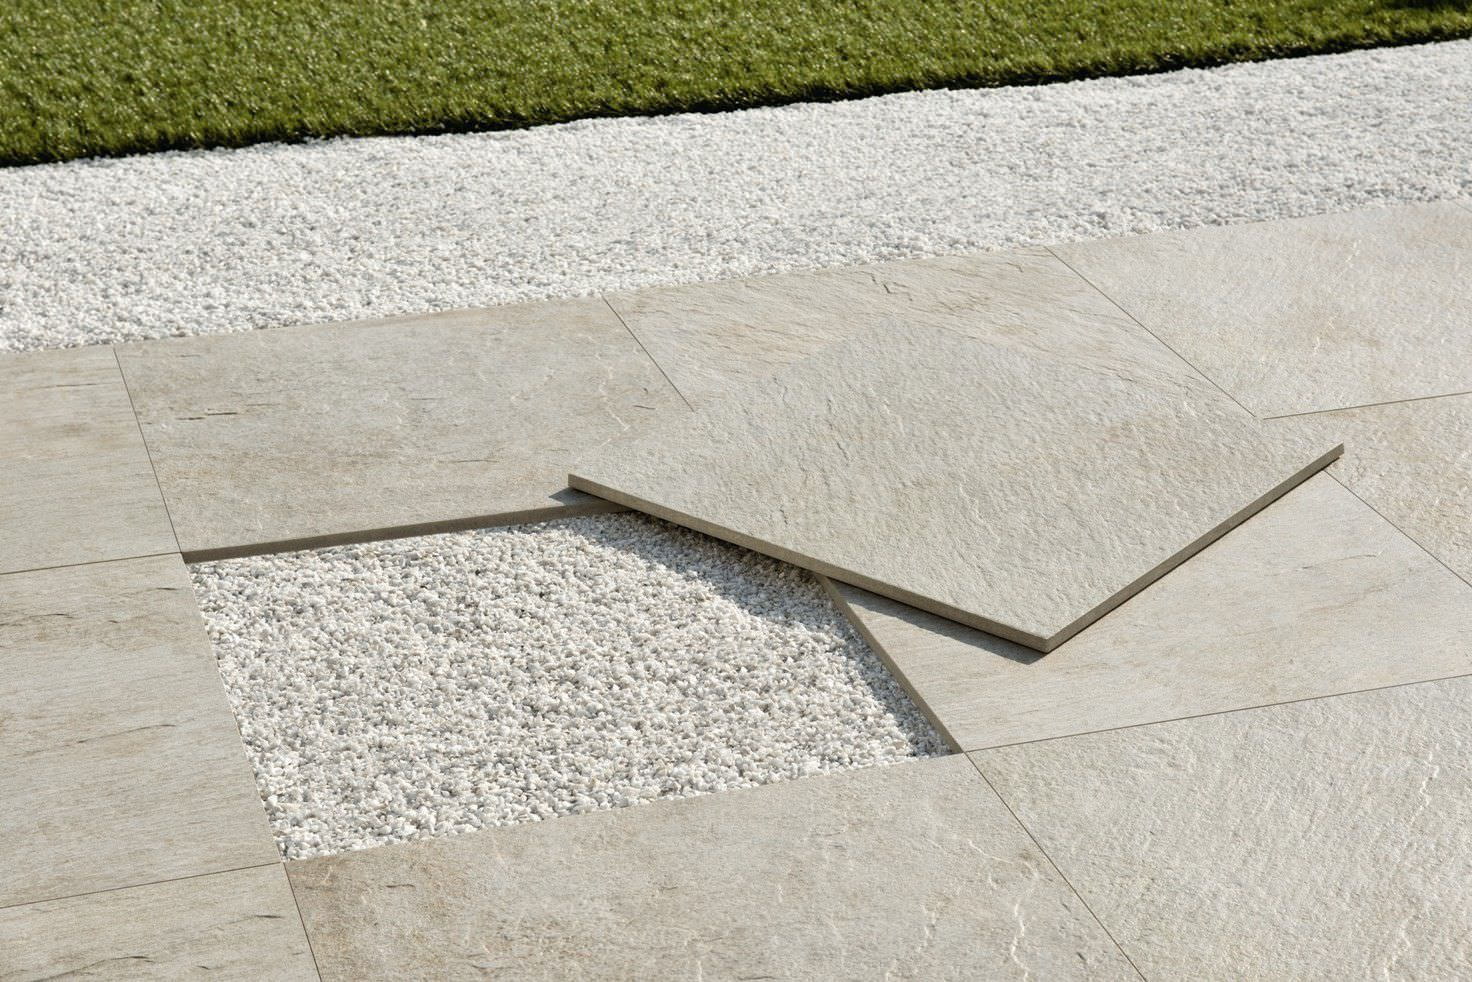 Baldosa pavimento exterior gres porcelanico antideslizante - Pavimento terraza exterior ...